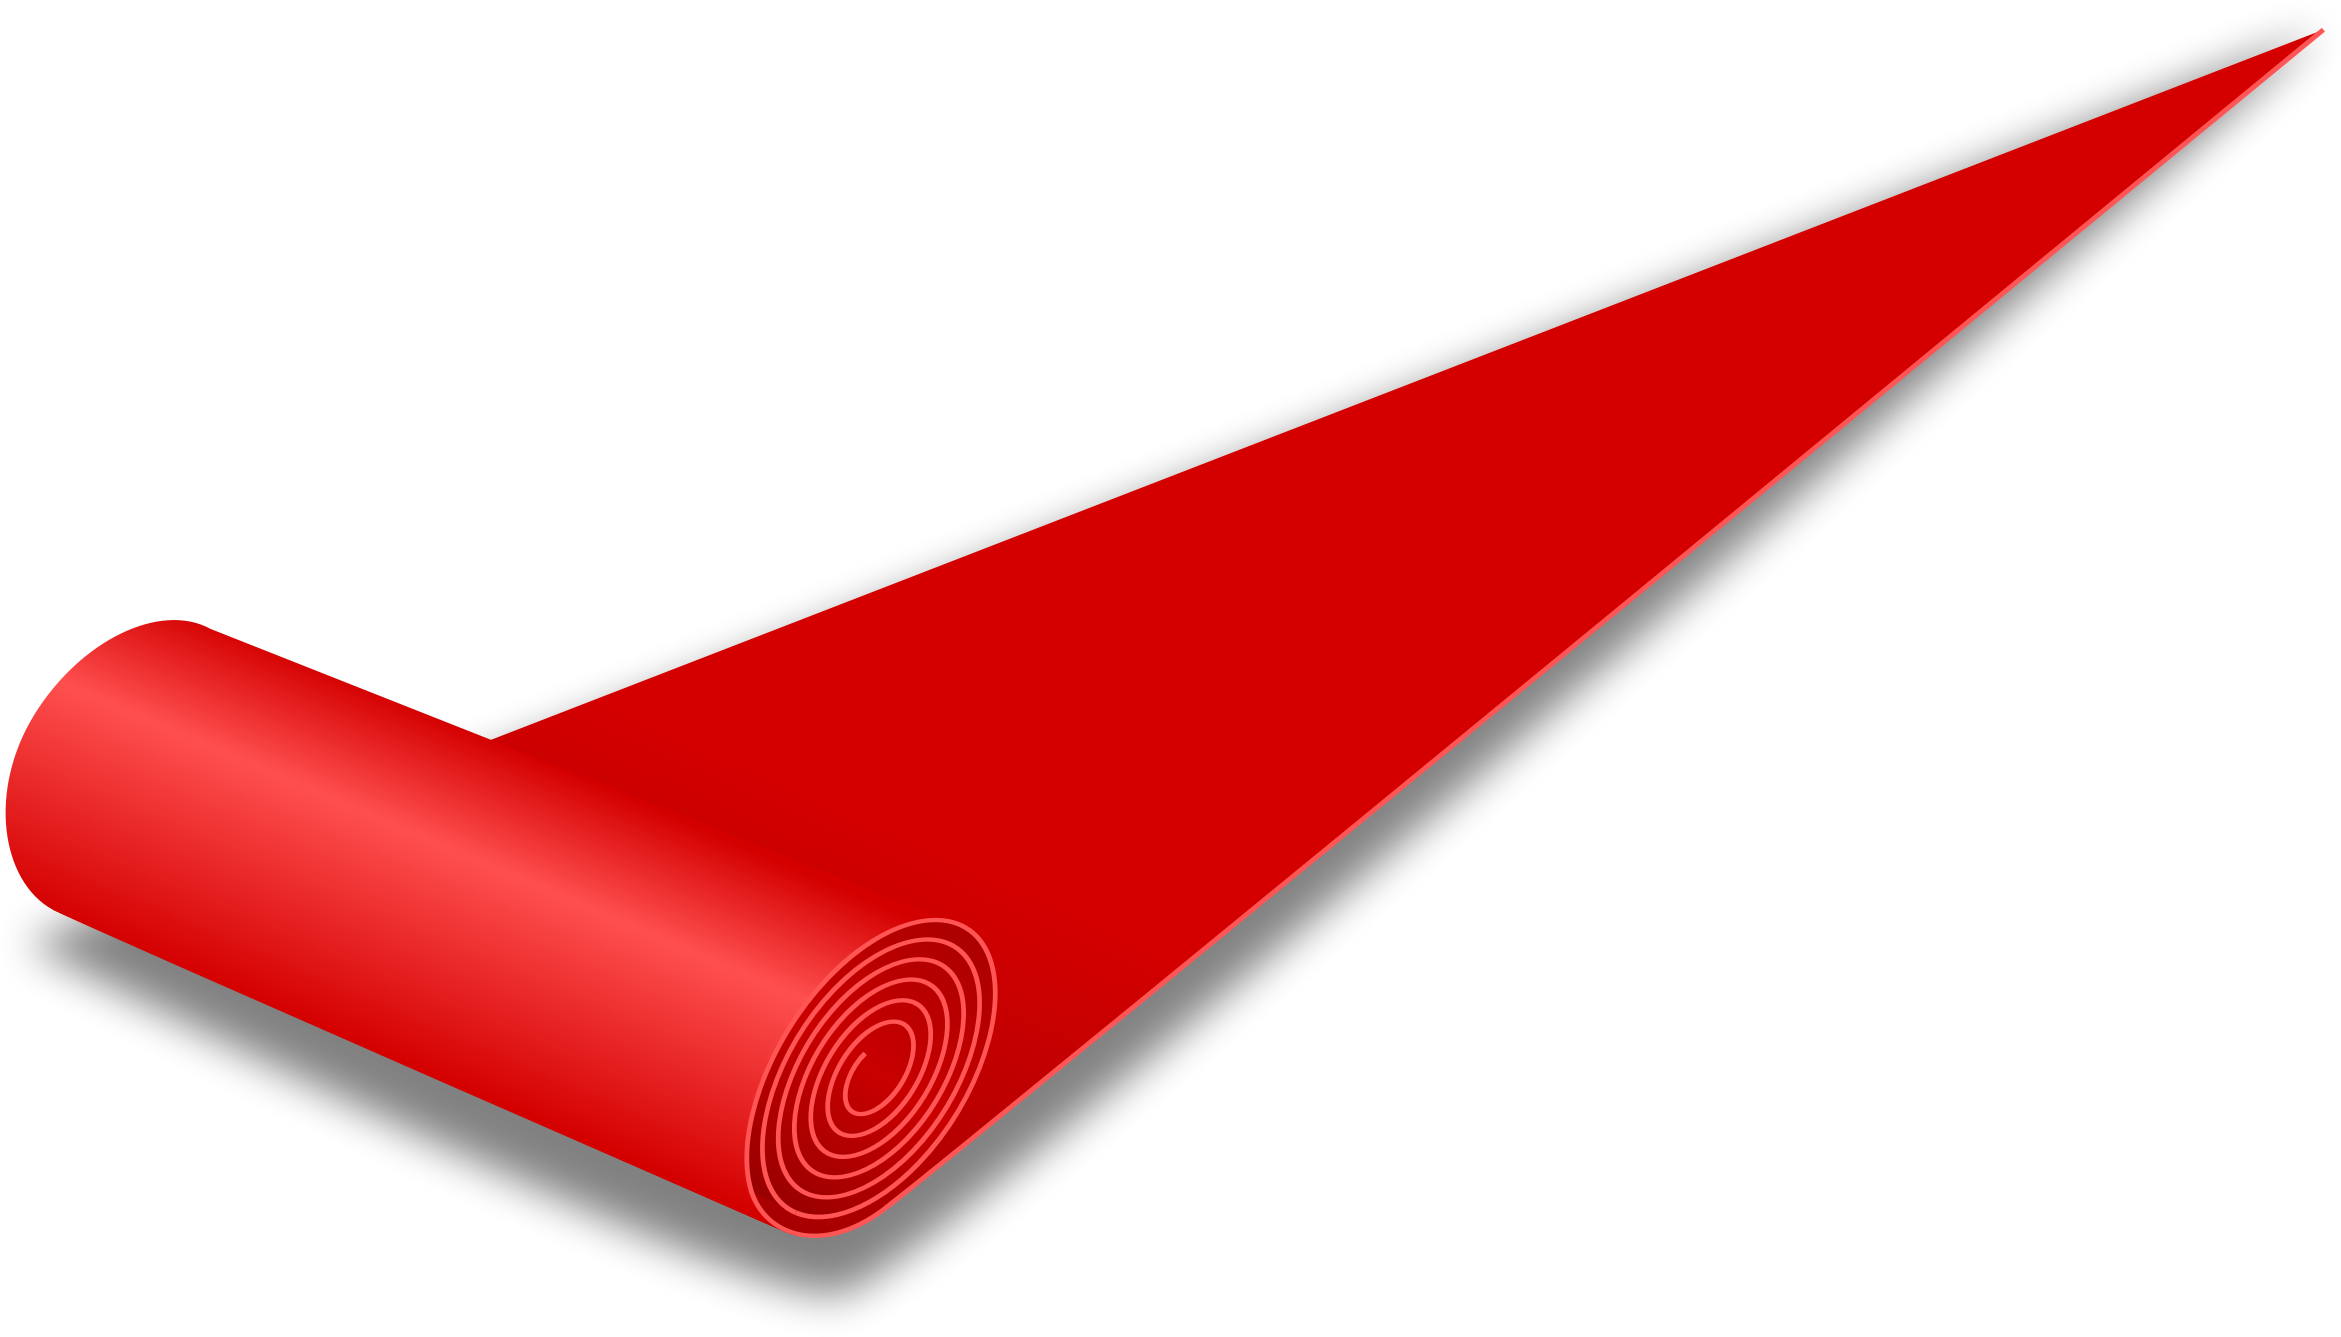 Red Carpet clipart Carpet Carpet Clipart Red Red